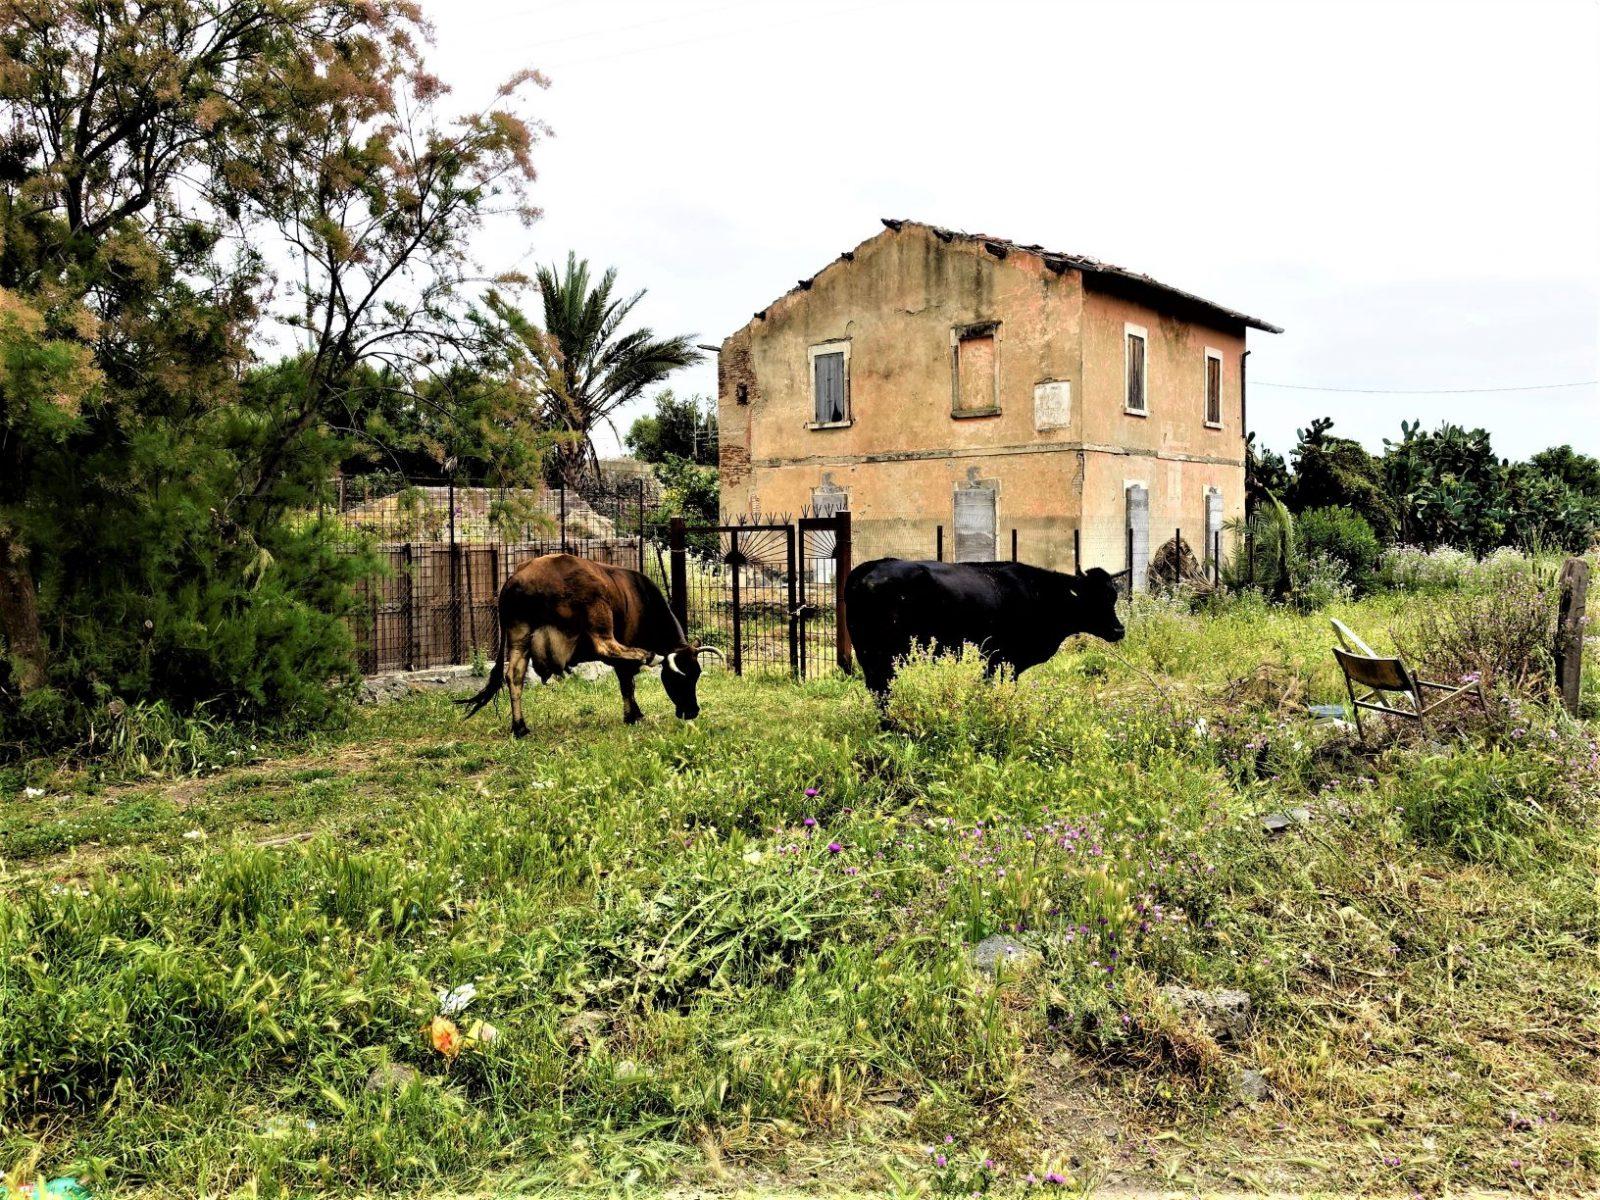 Kuer på Sicilia Catania